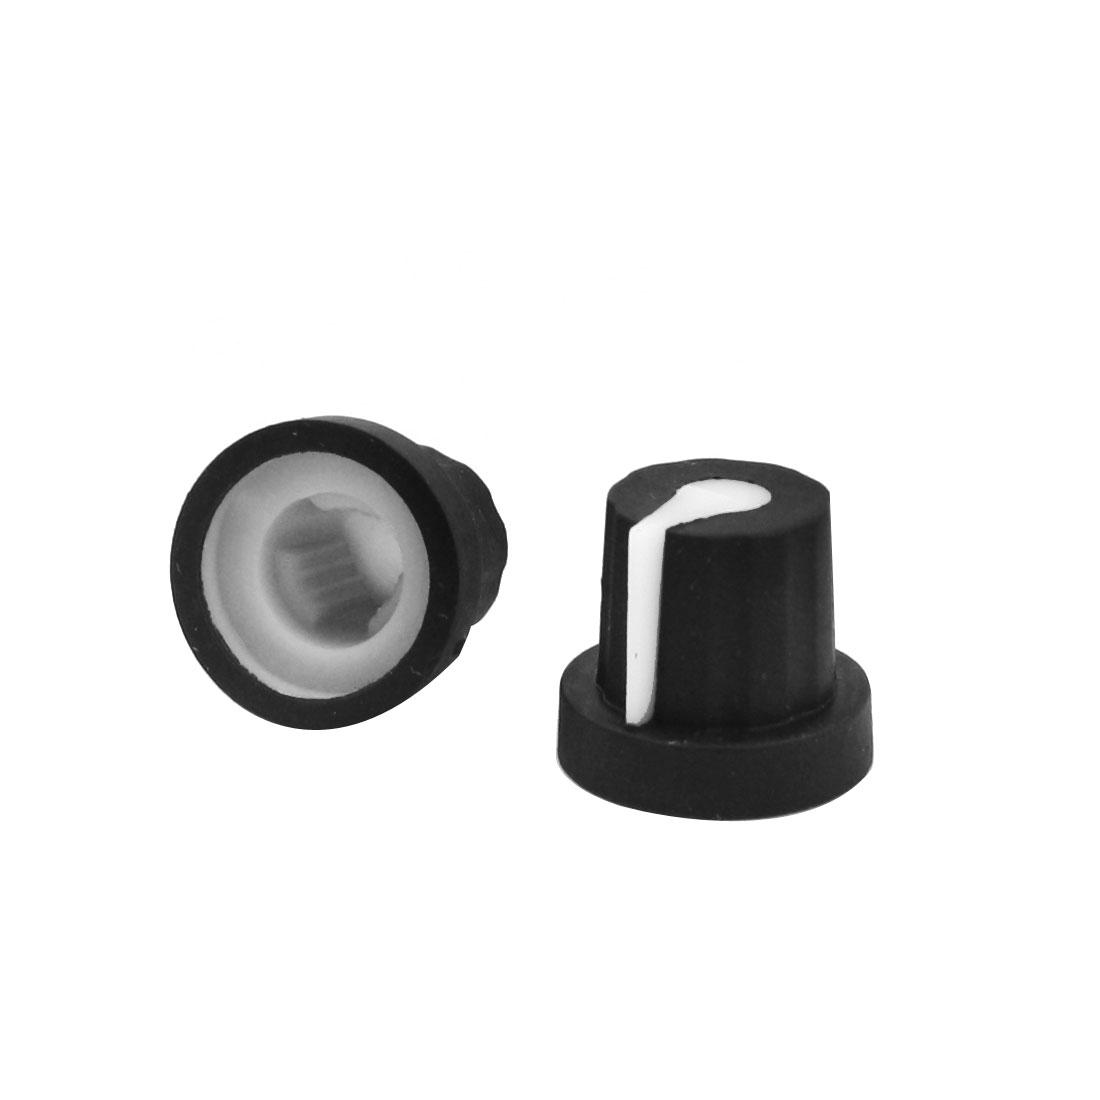 6mm Split Shaft Stereo Radio Taper Potentiometer Volume Knob Cap 2pcs